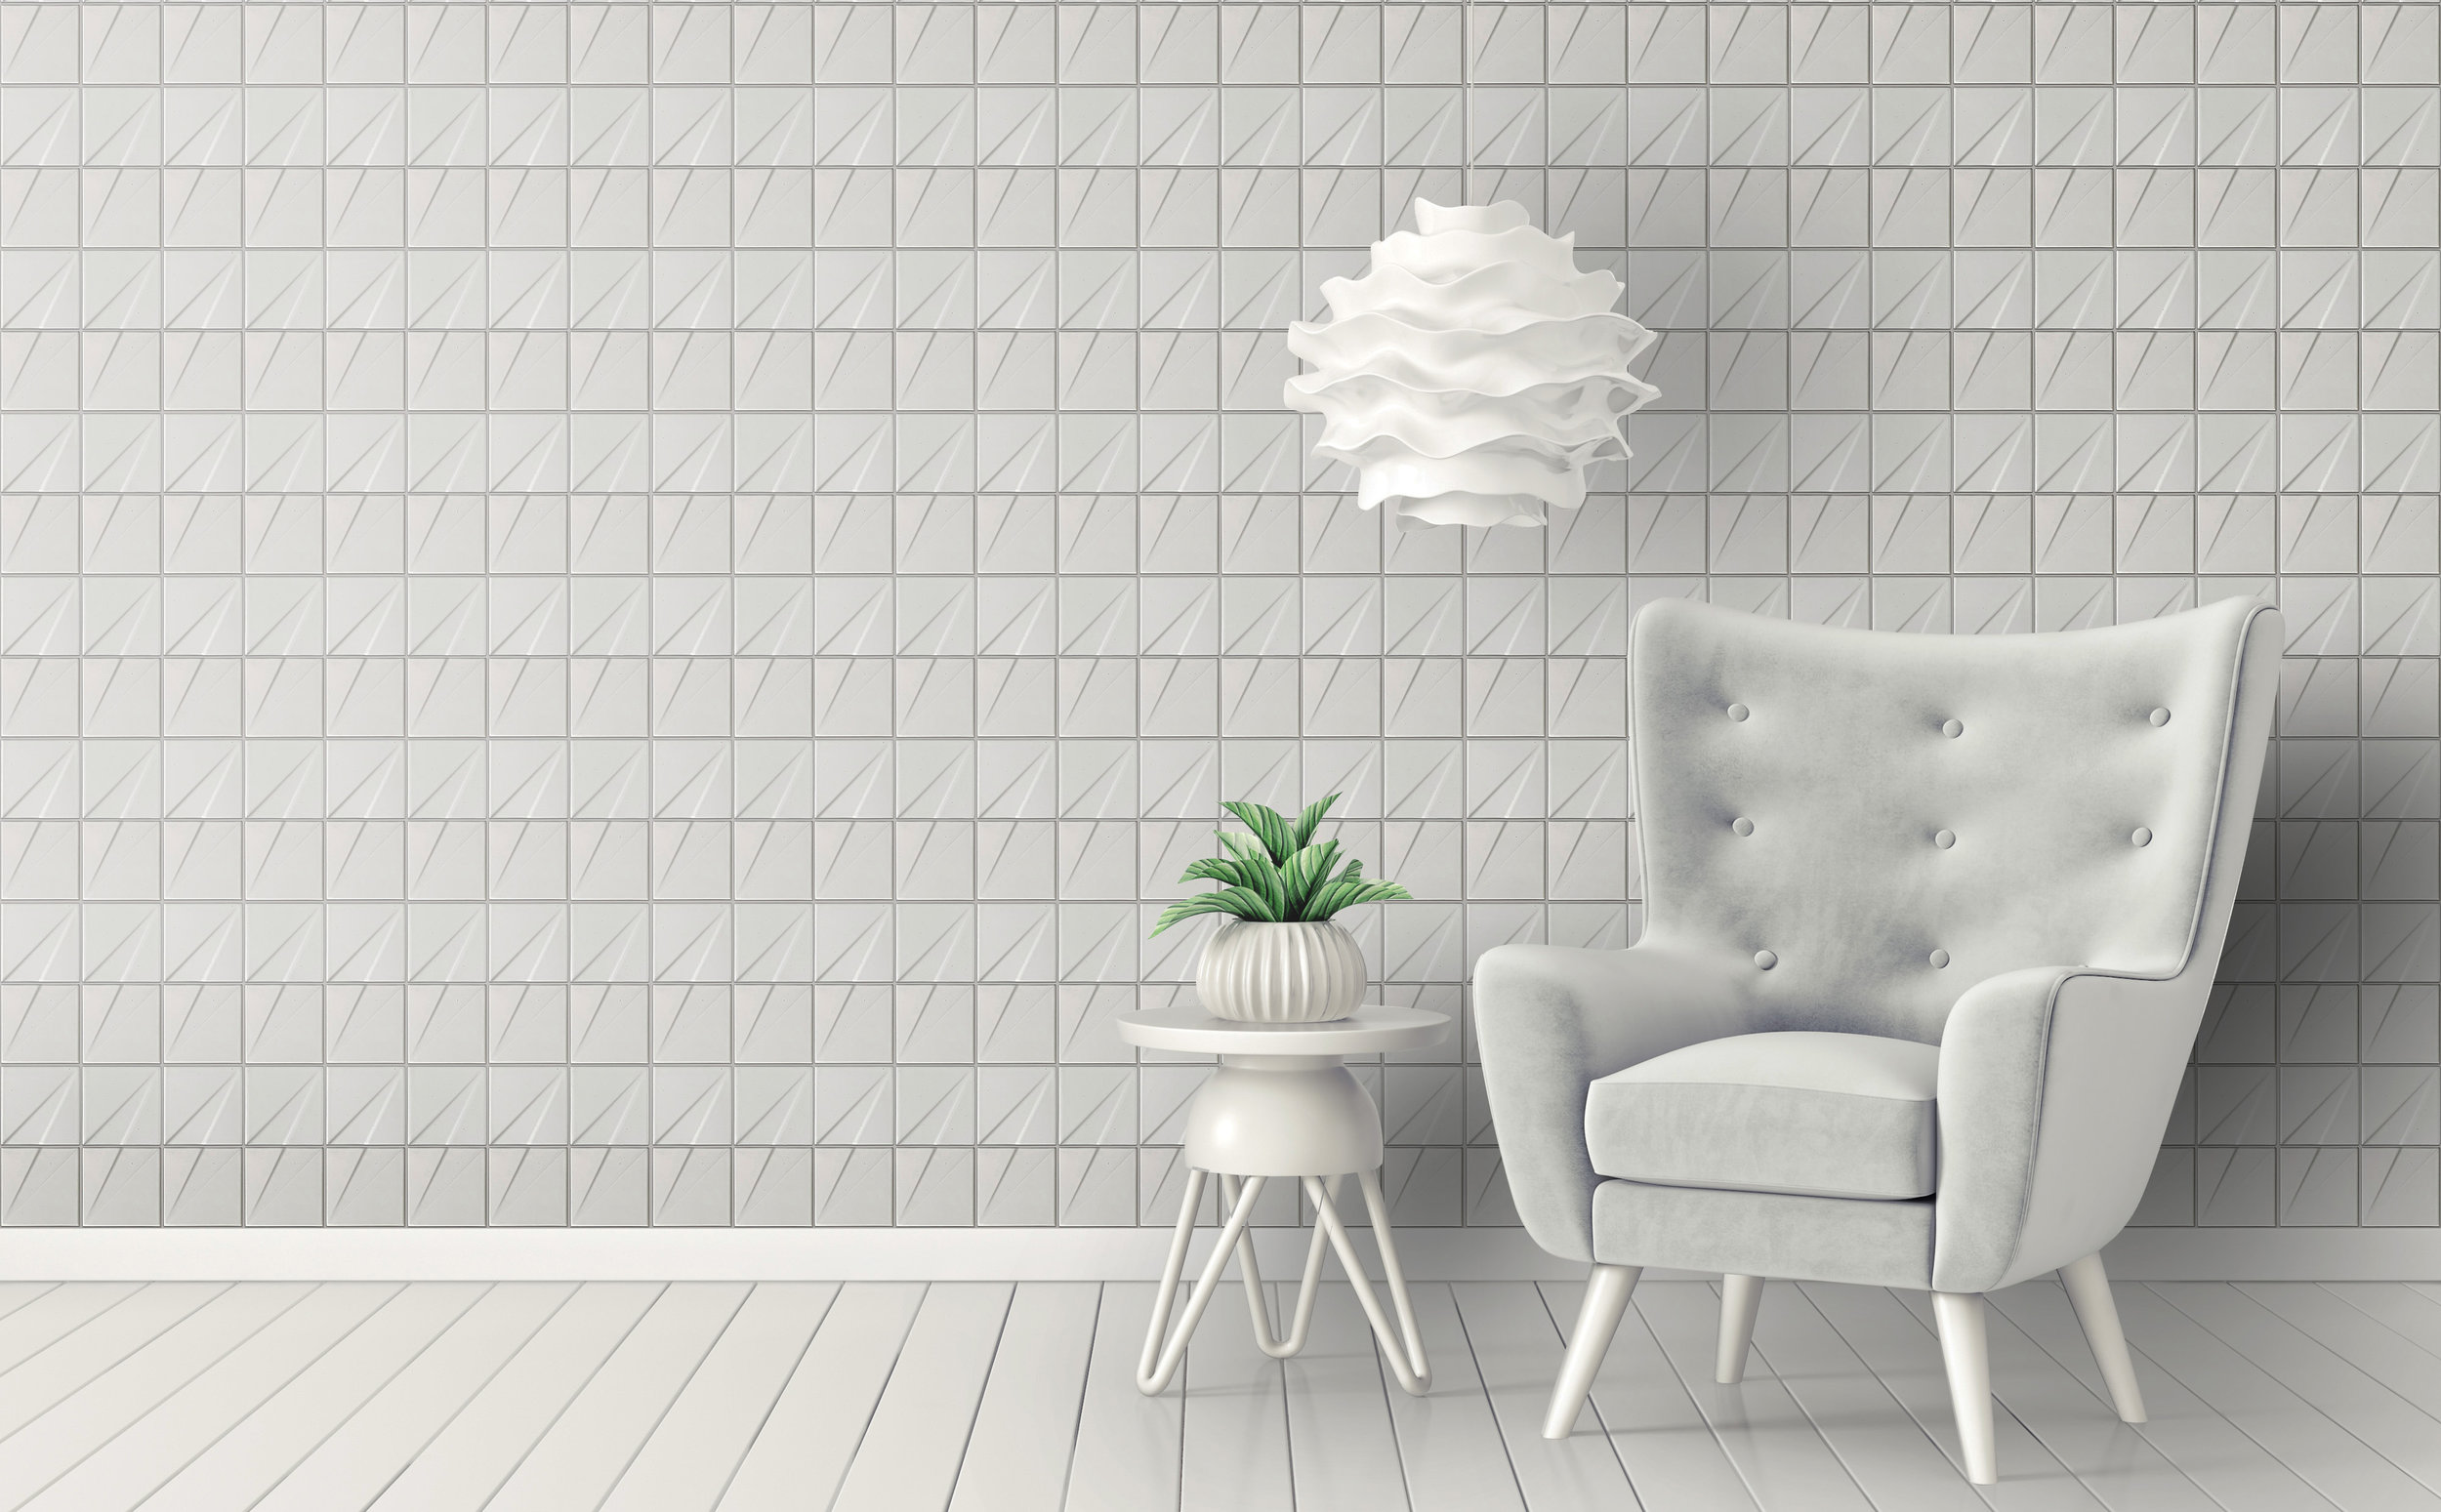 RF443-Matte White as the wall tiles